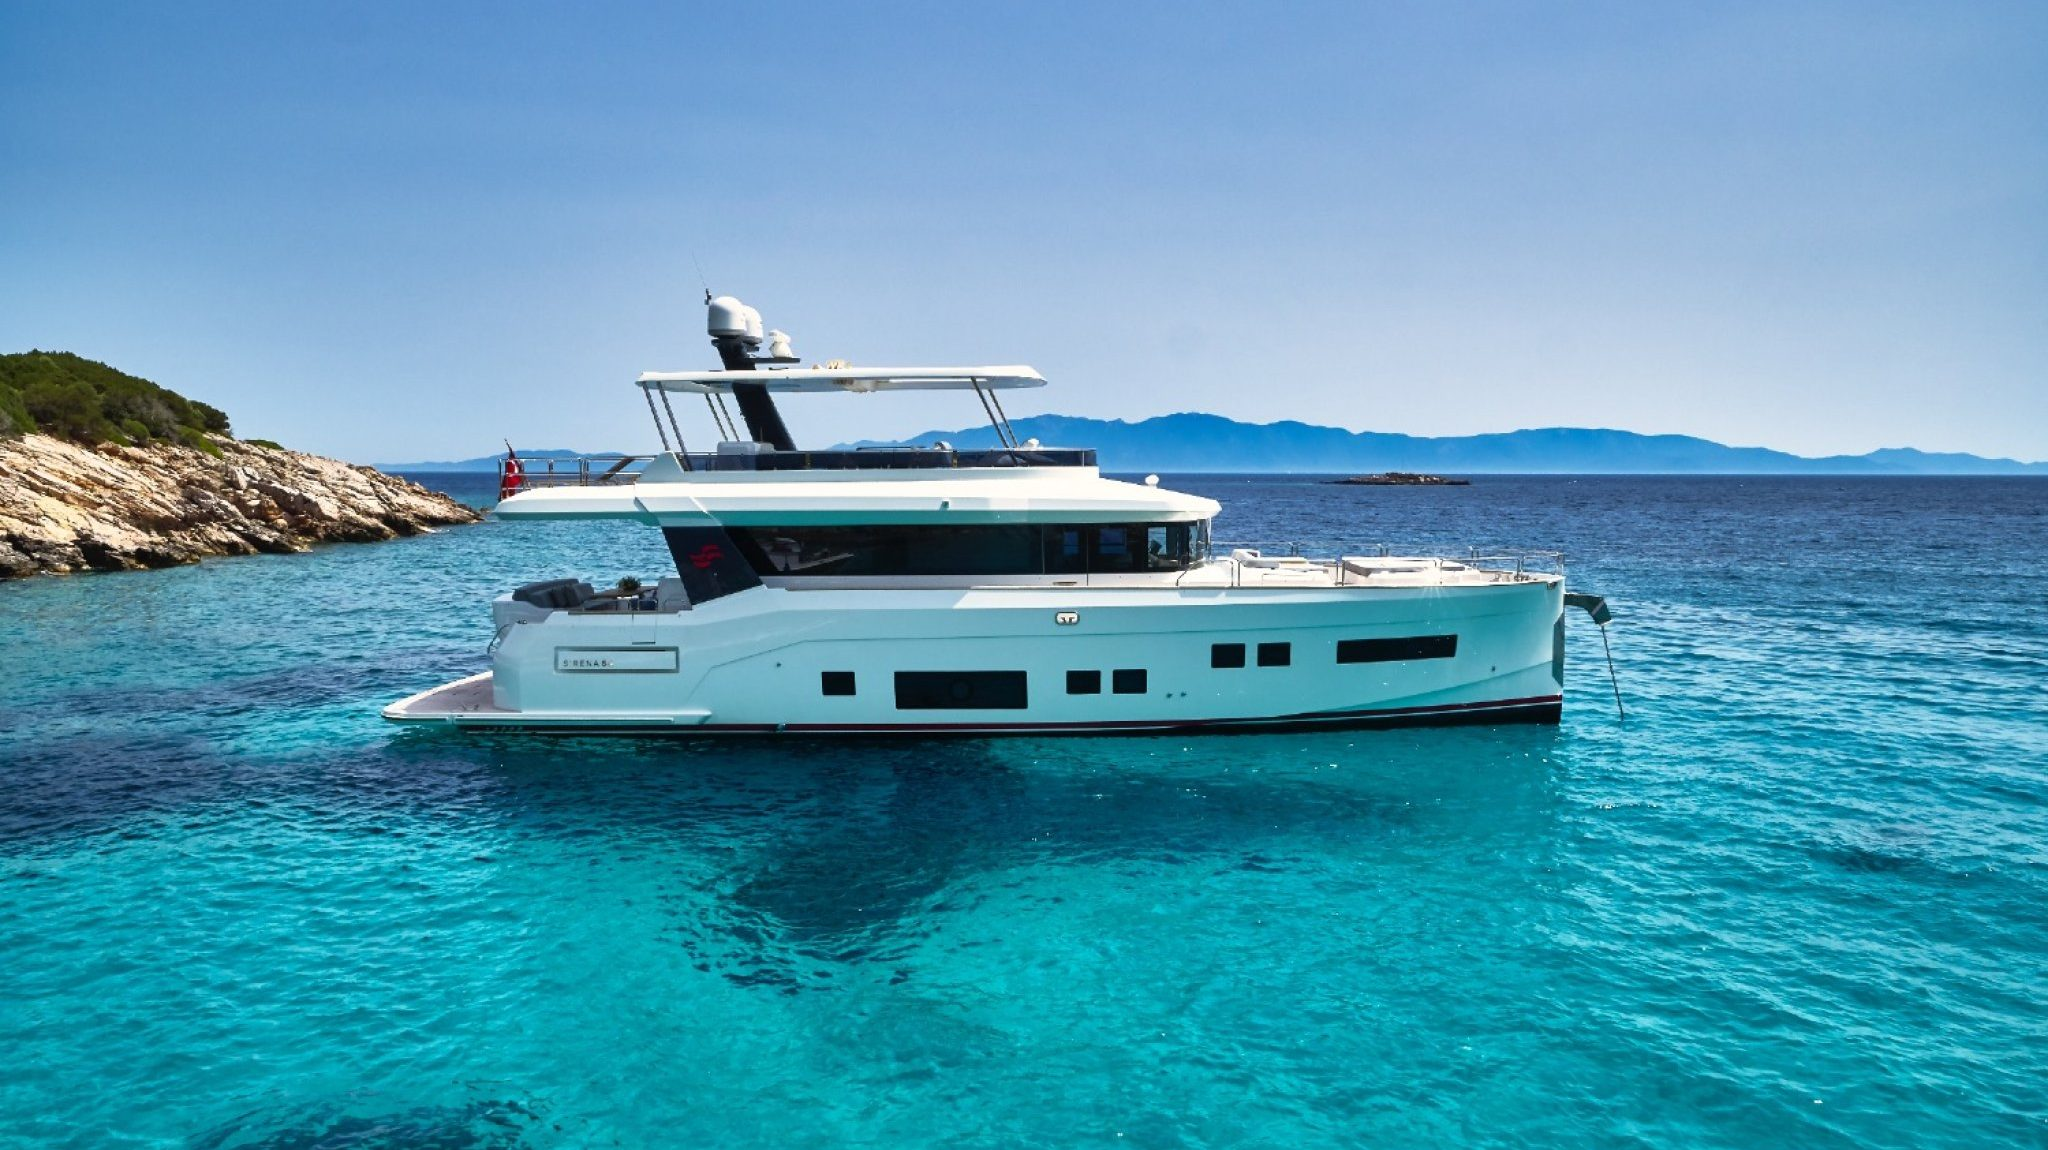 Sirena 64, Eyachts Australia and New Zealand